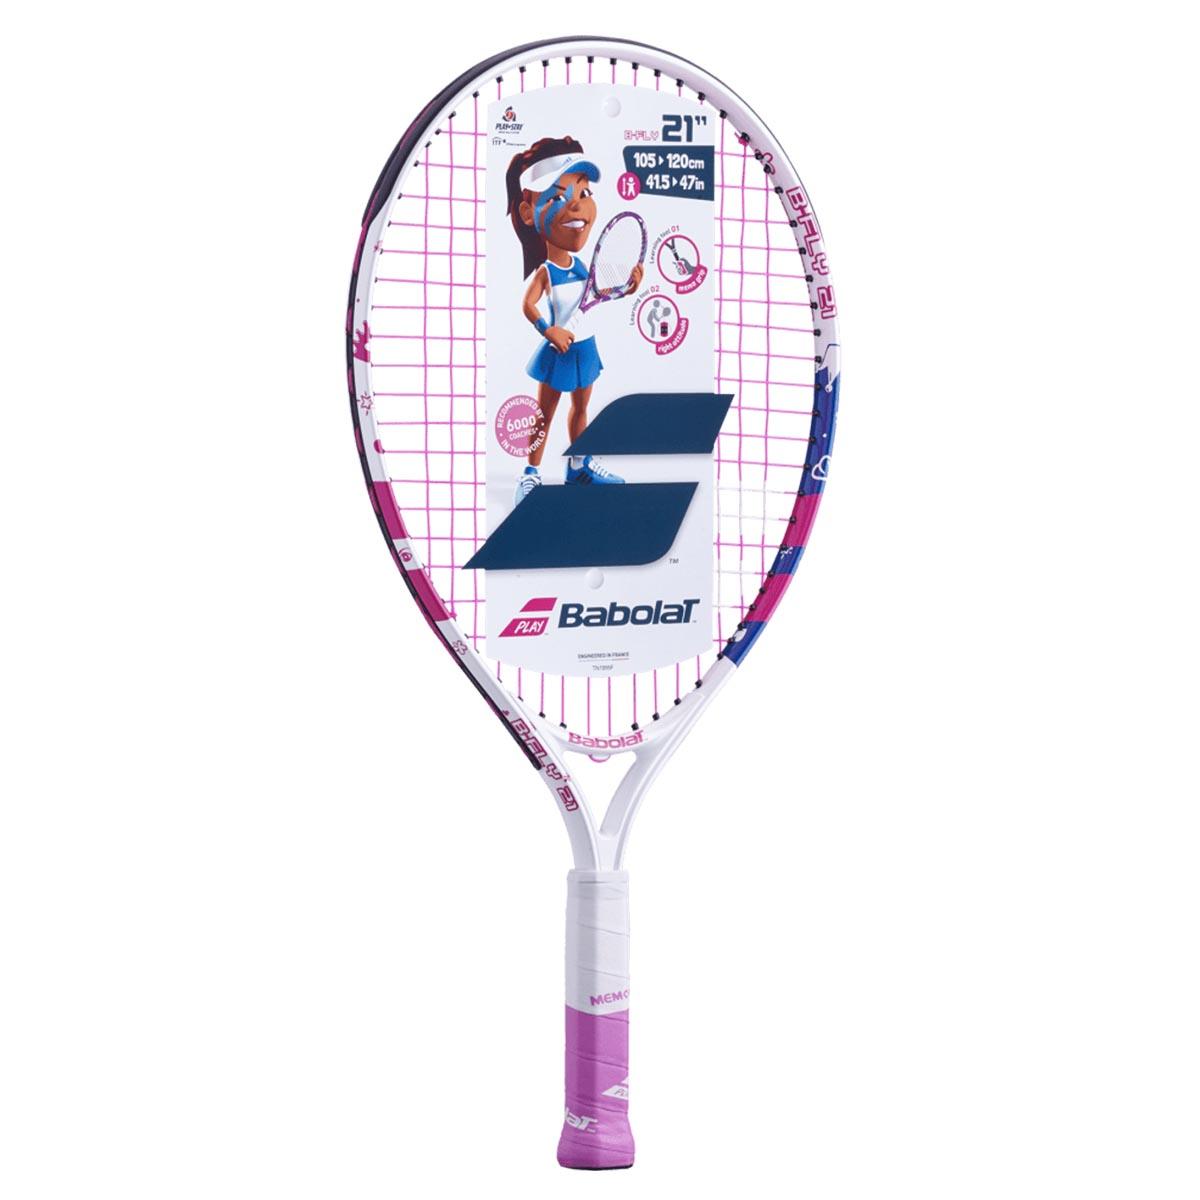 Ракетка для большого тенниса B FLY 21